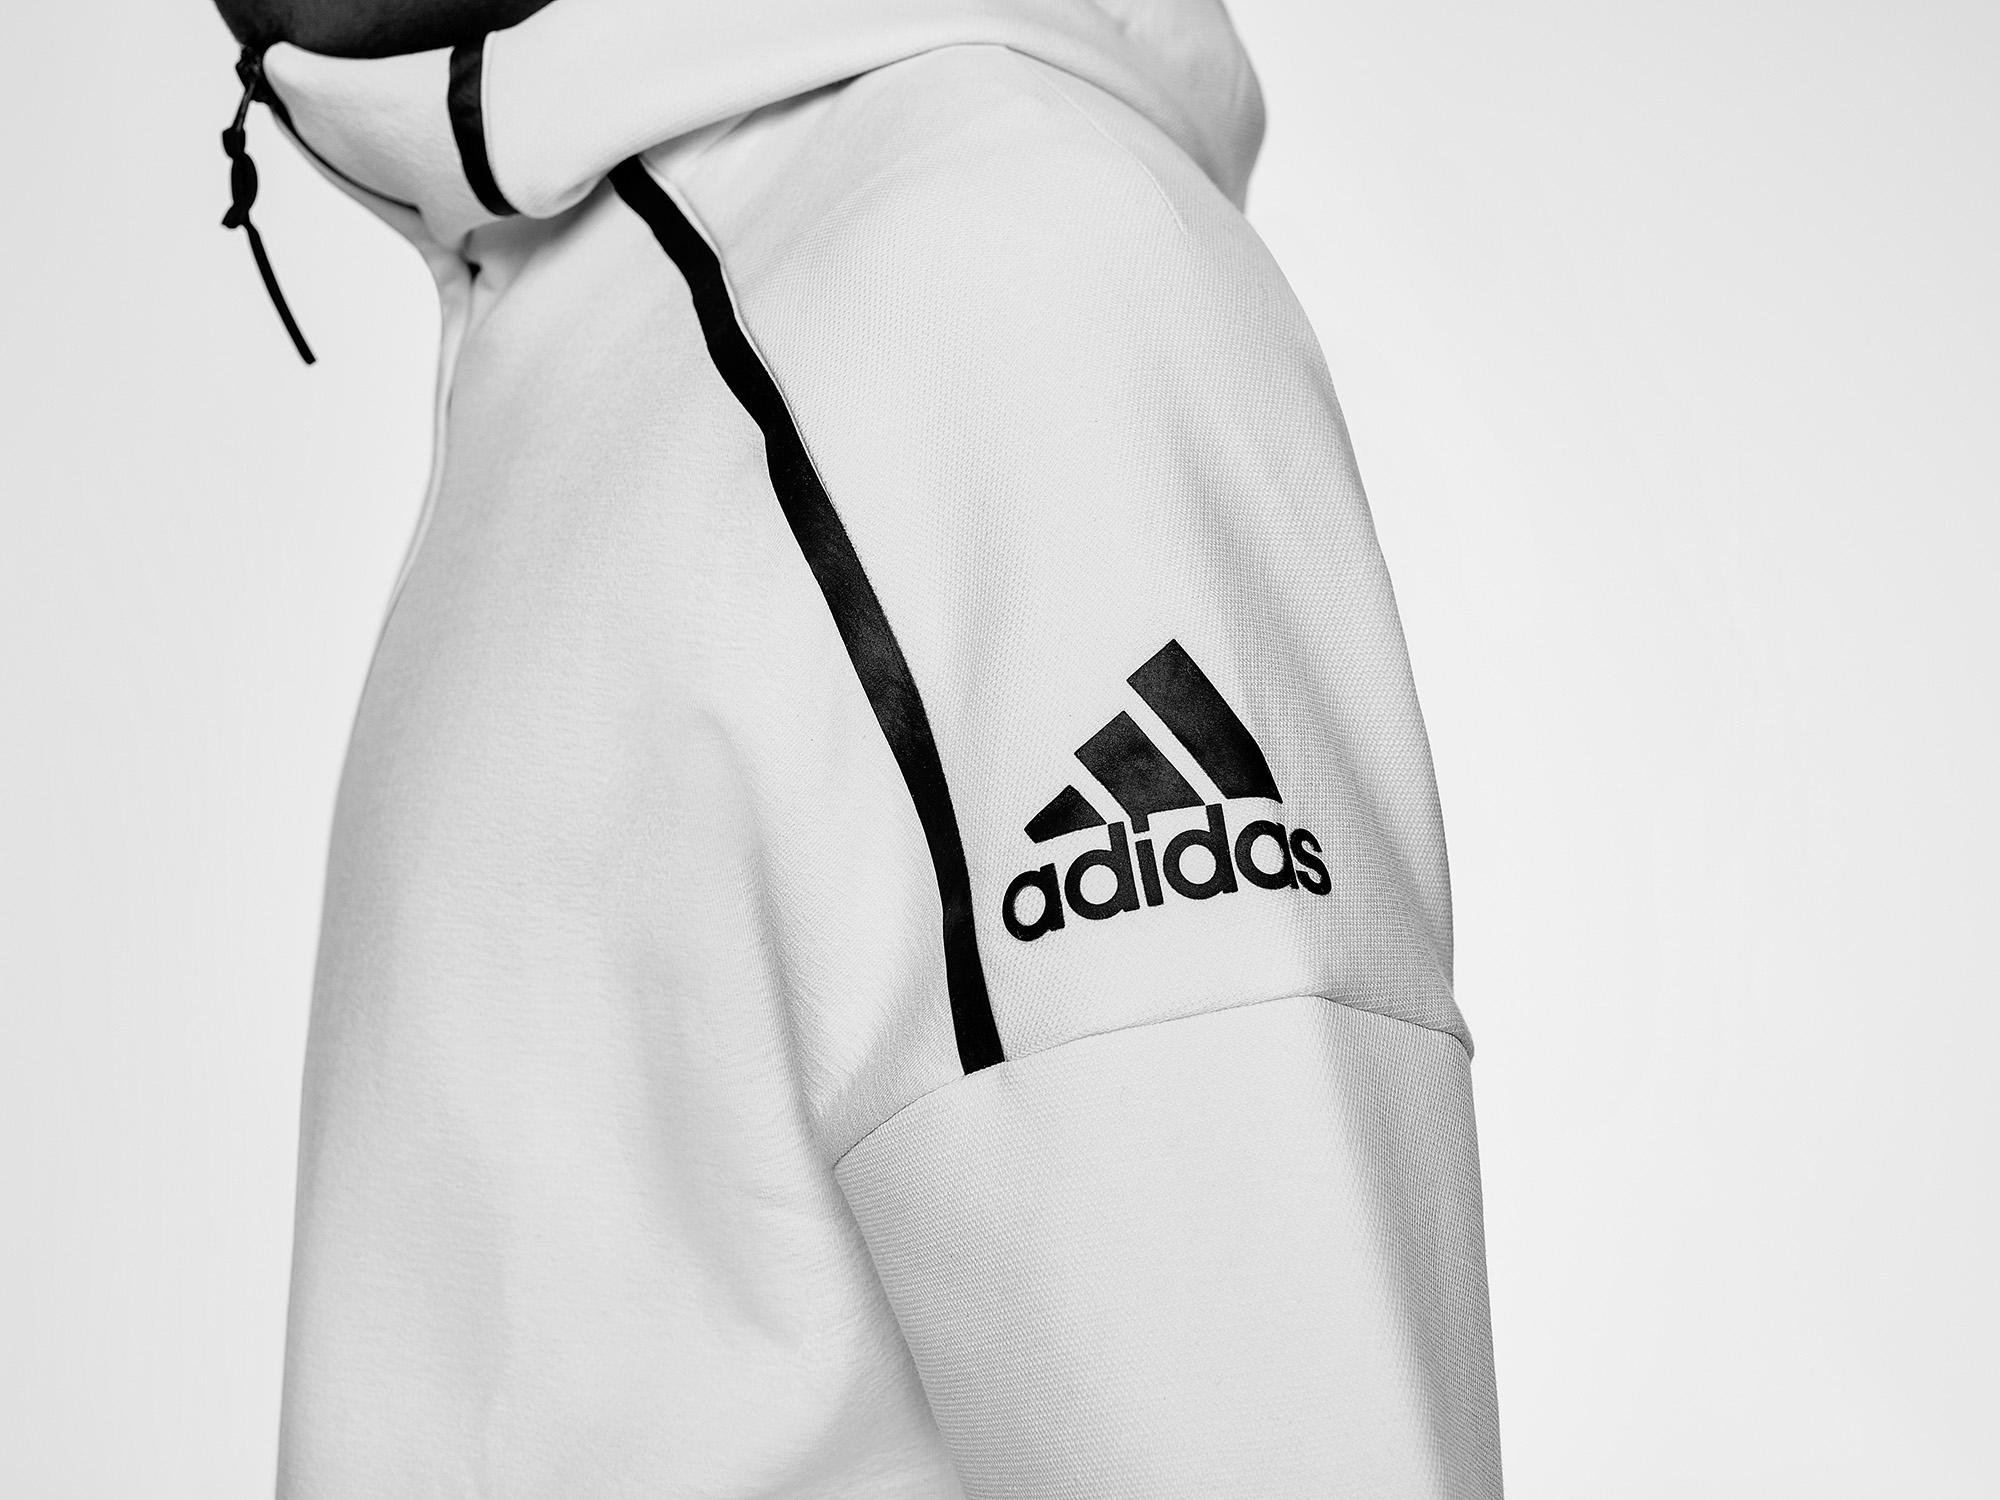 adidas-zero-dye-hoodie-detail